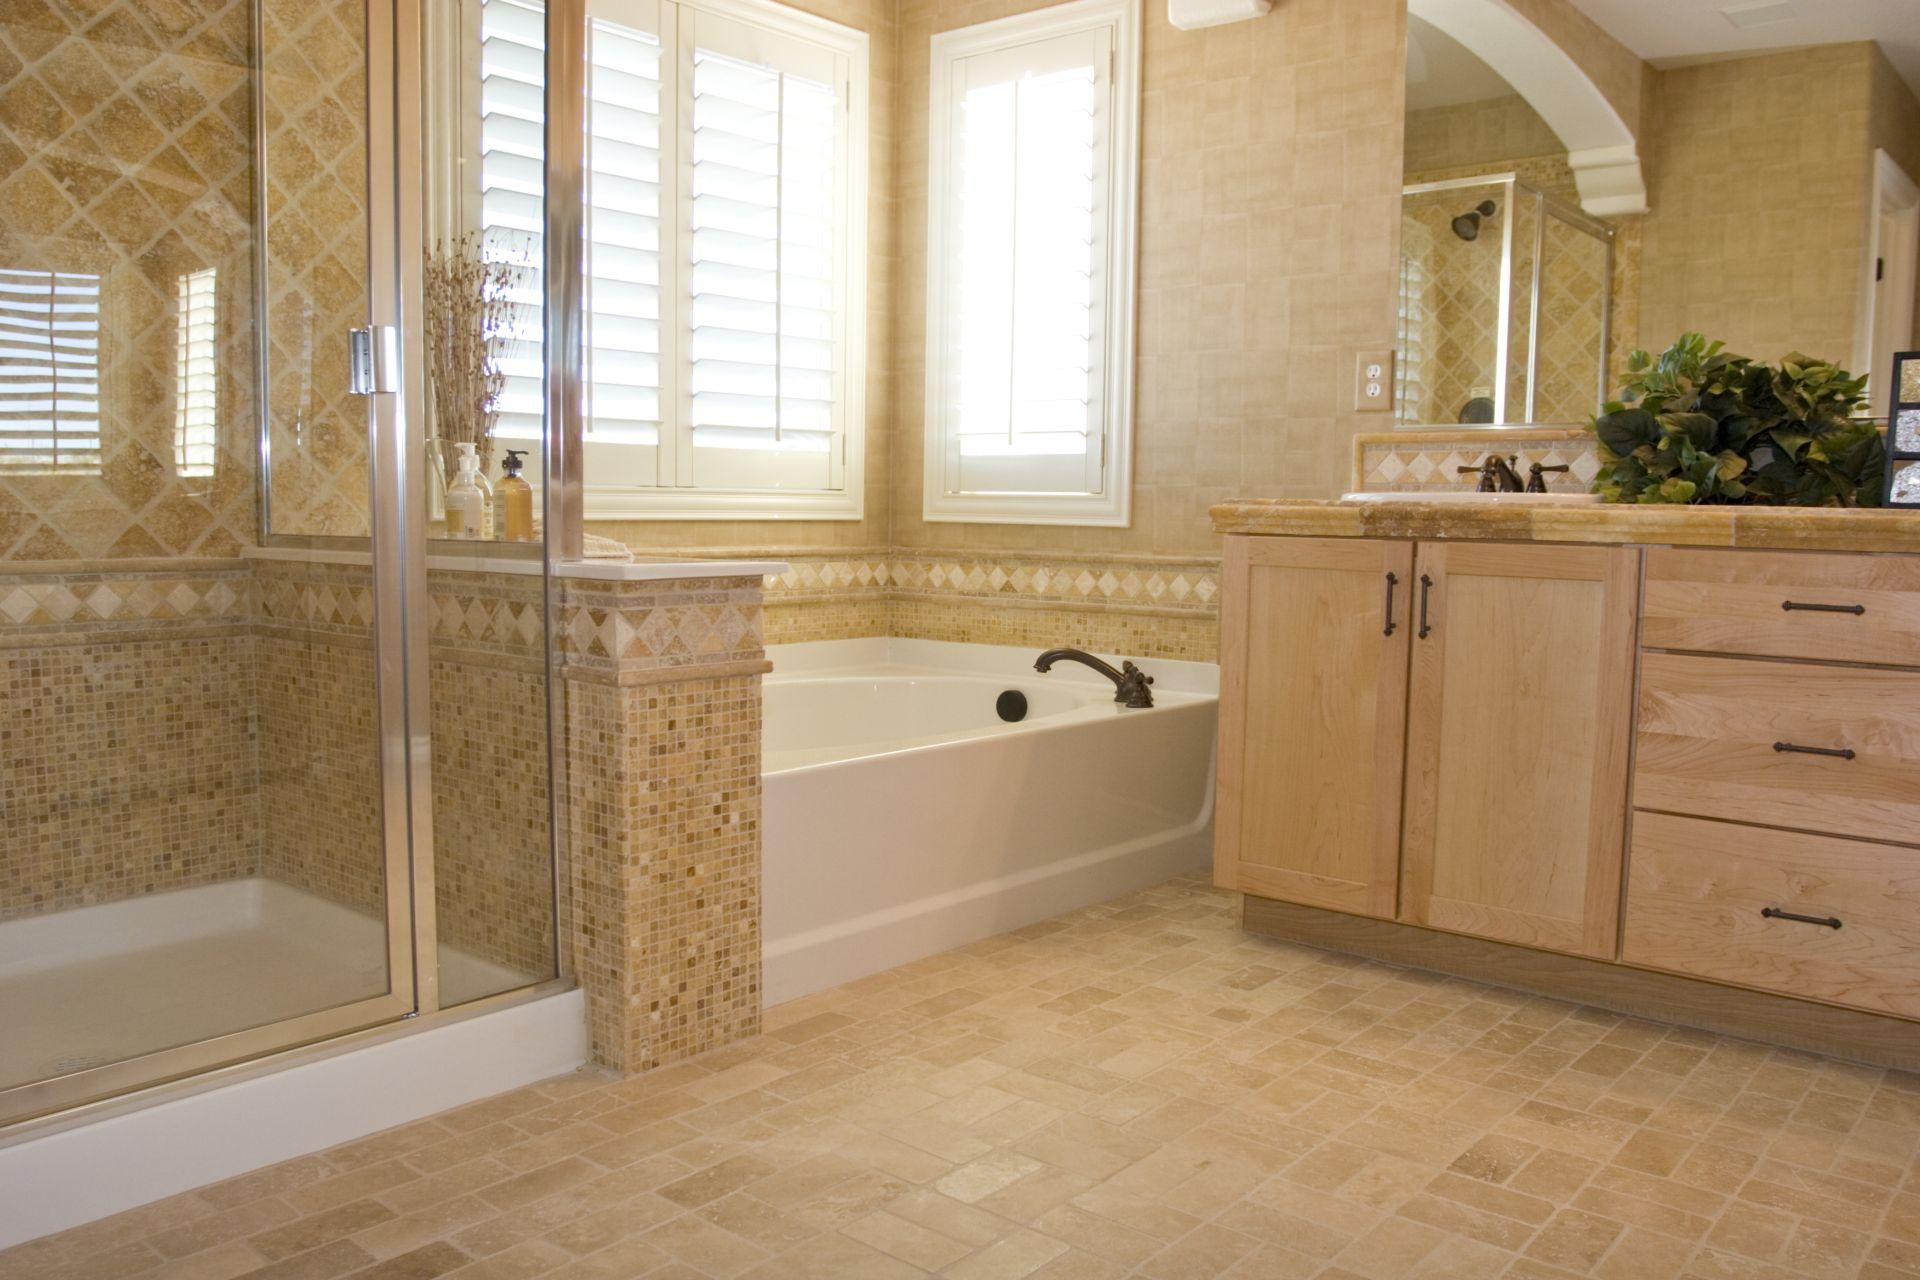 Дизайн ванной комнаты 2017-2018 с